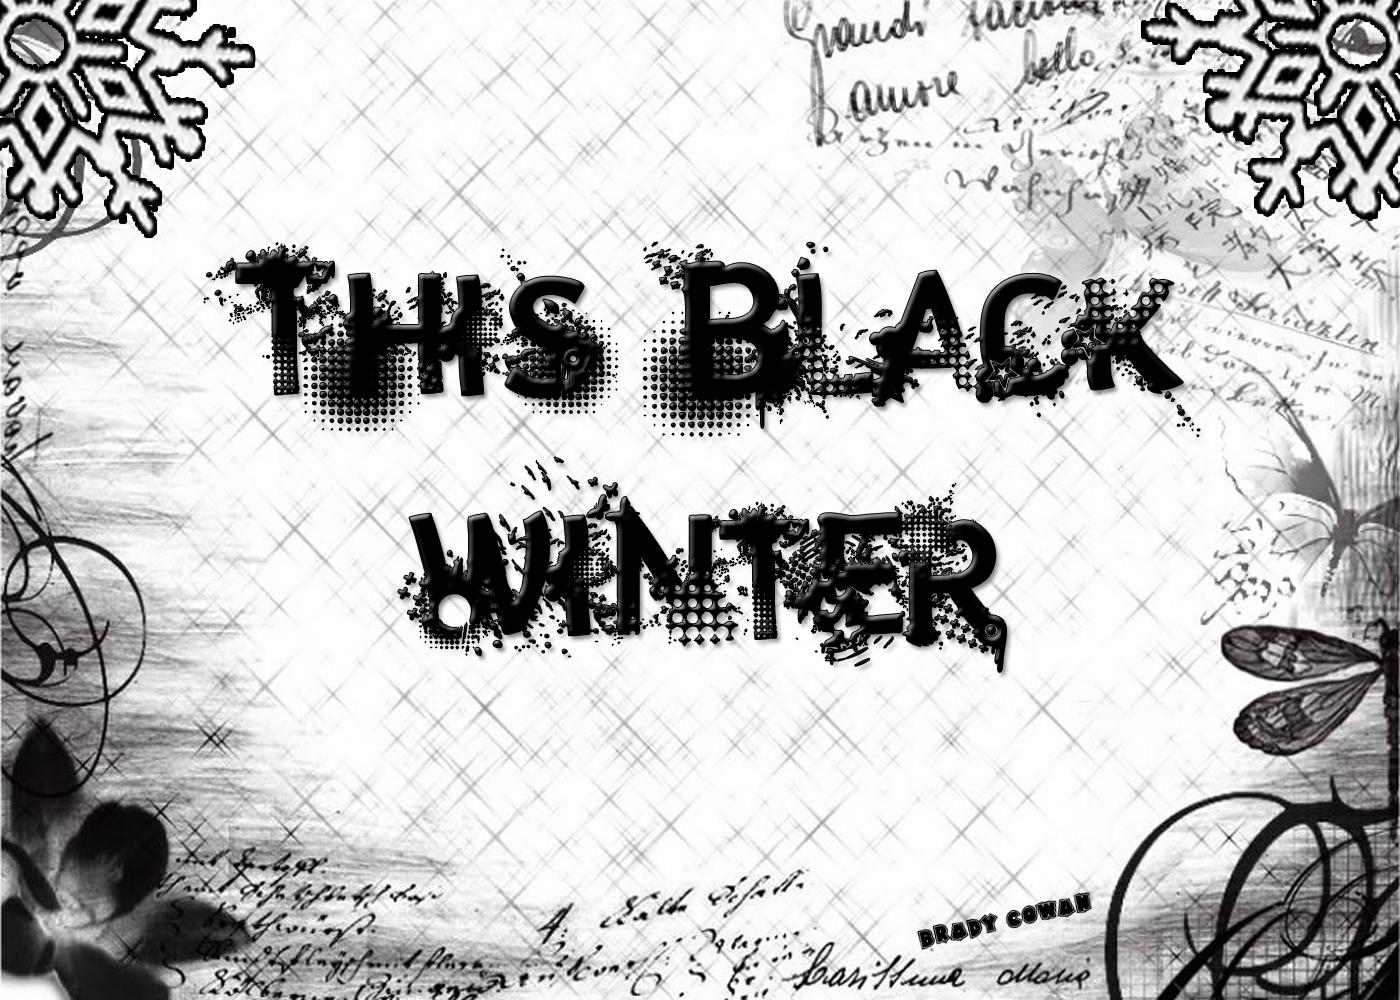 This Black Winter